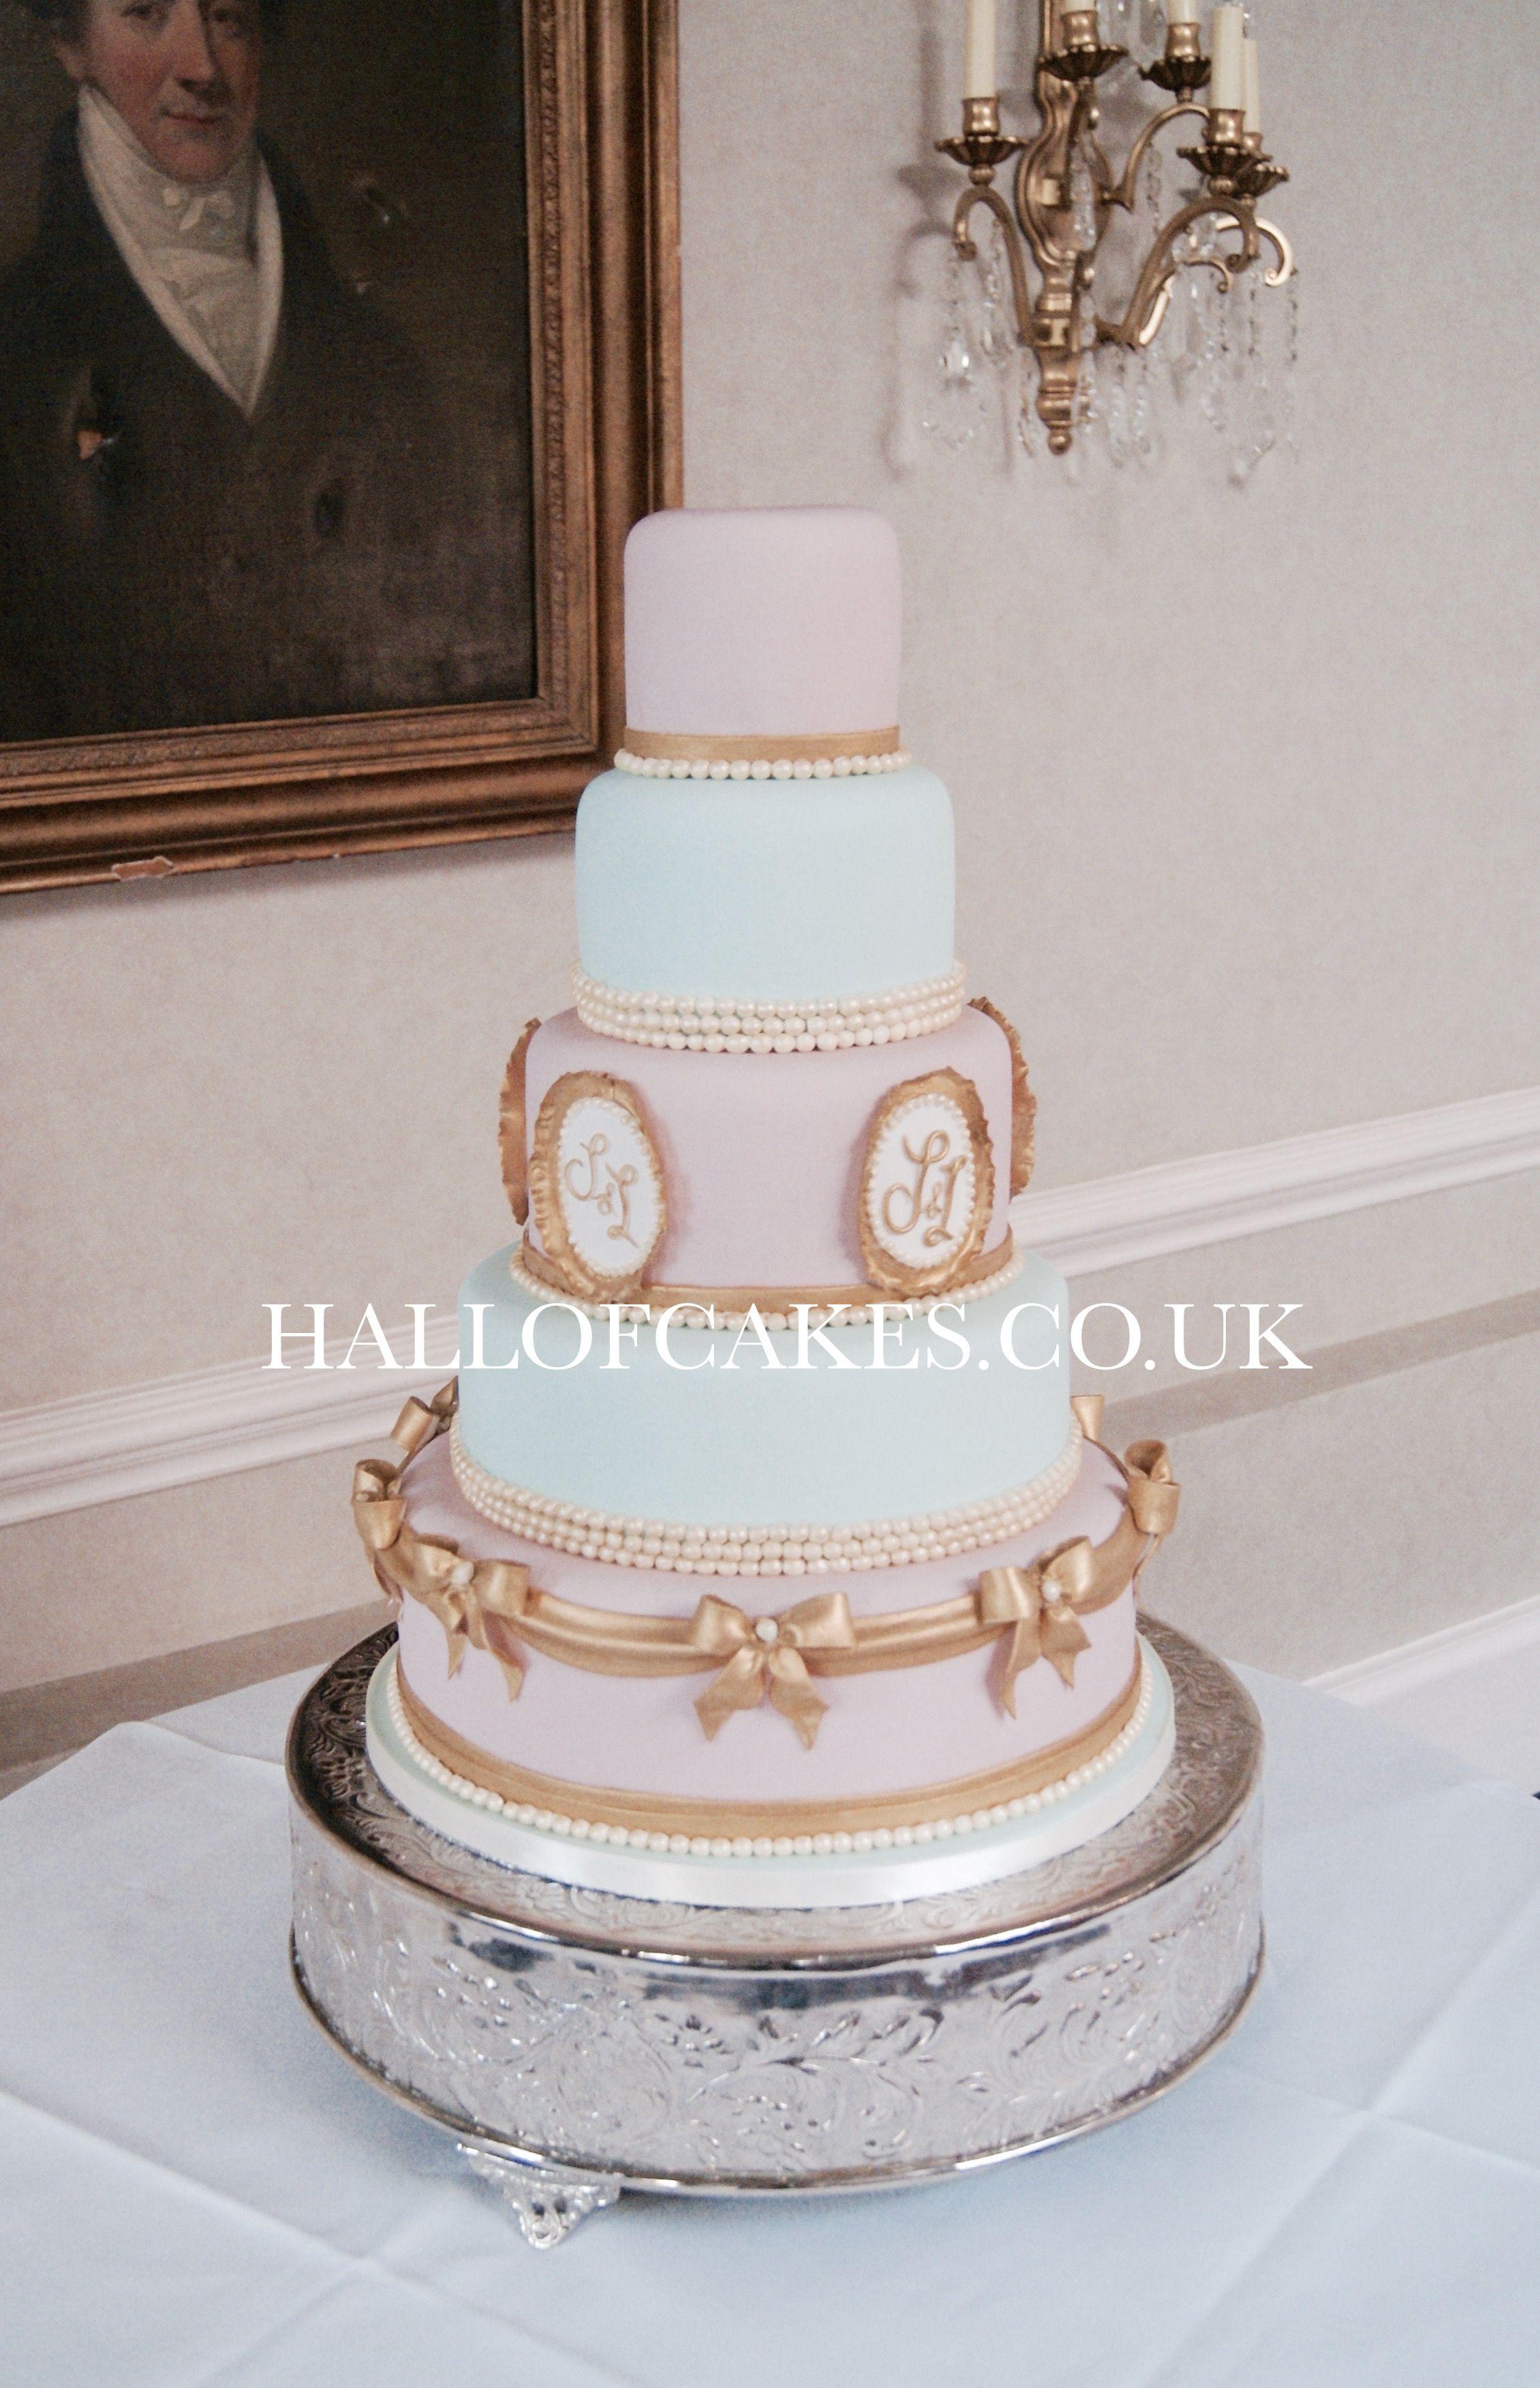 Laduree style wedding cake by hall of cakes wedding cakes